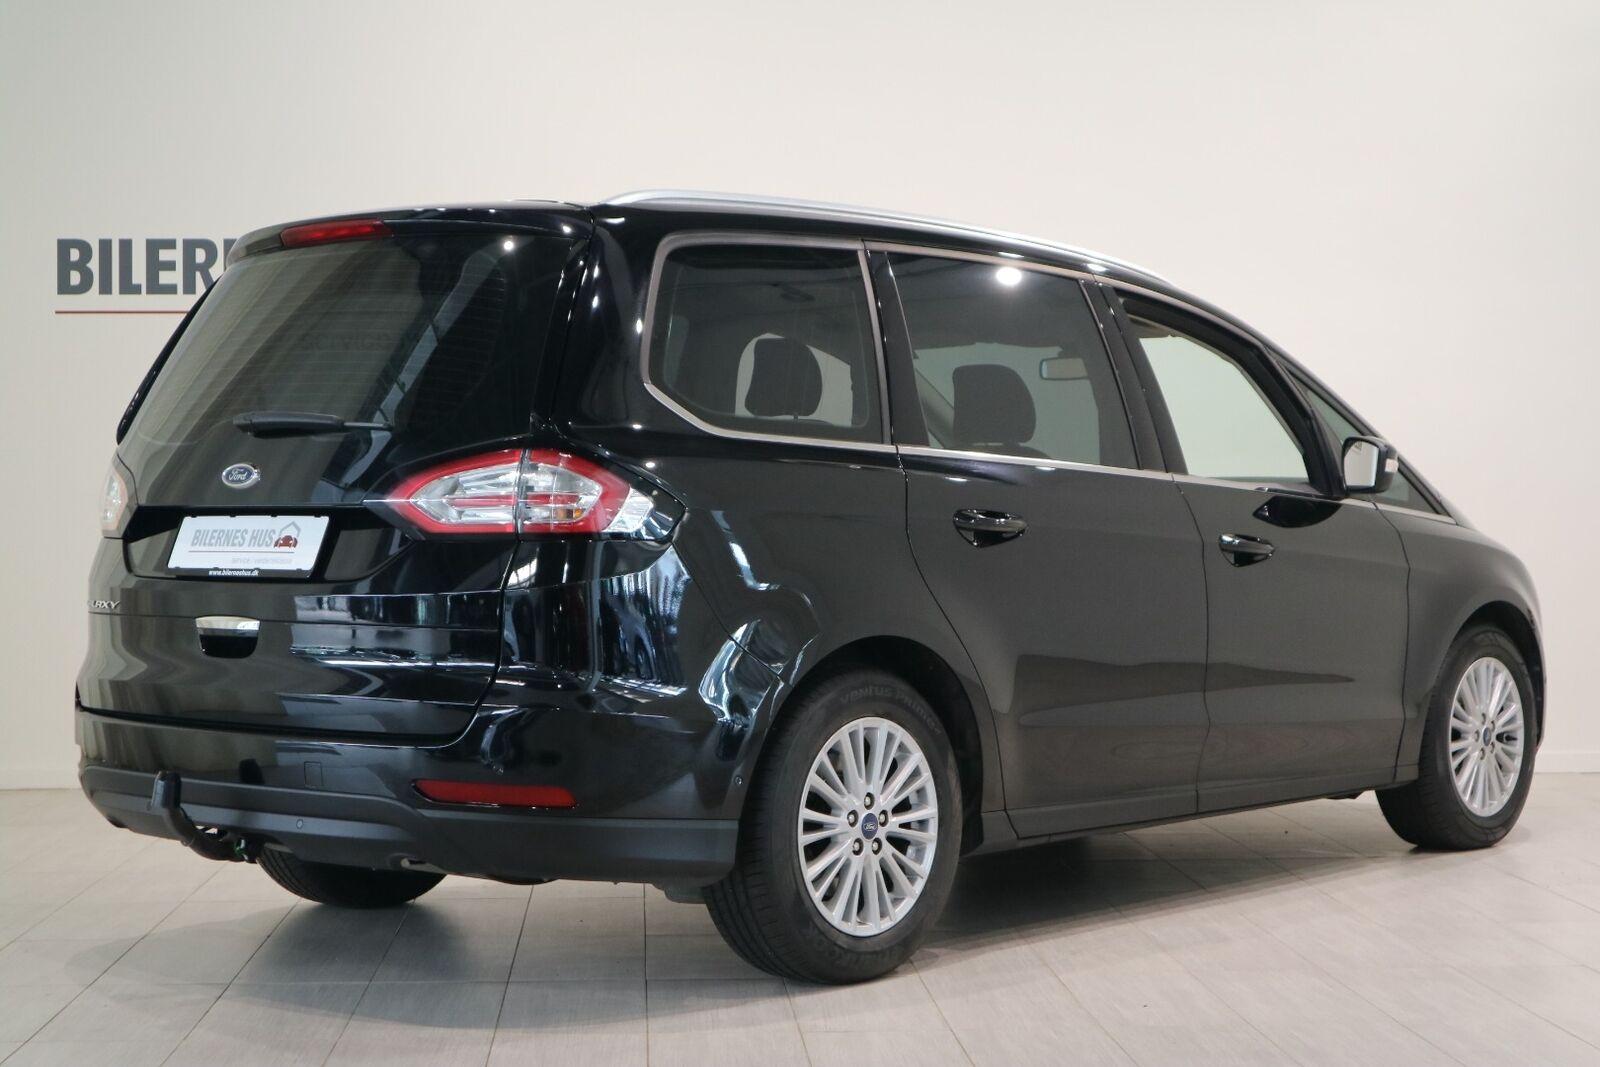 Ford Galaxy 2,0 TDCi 180 Titanium aut. - billede 1